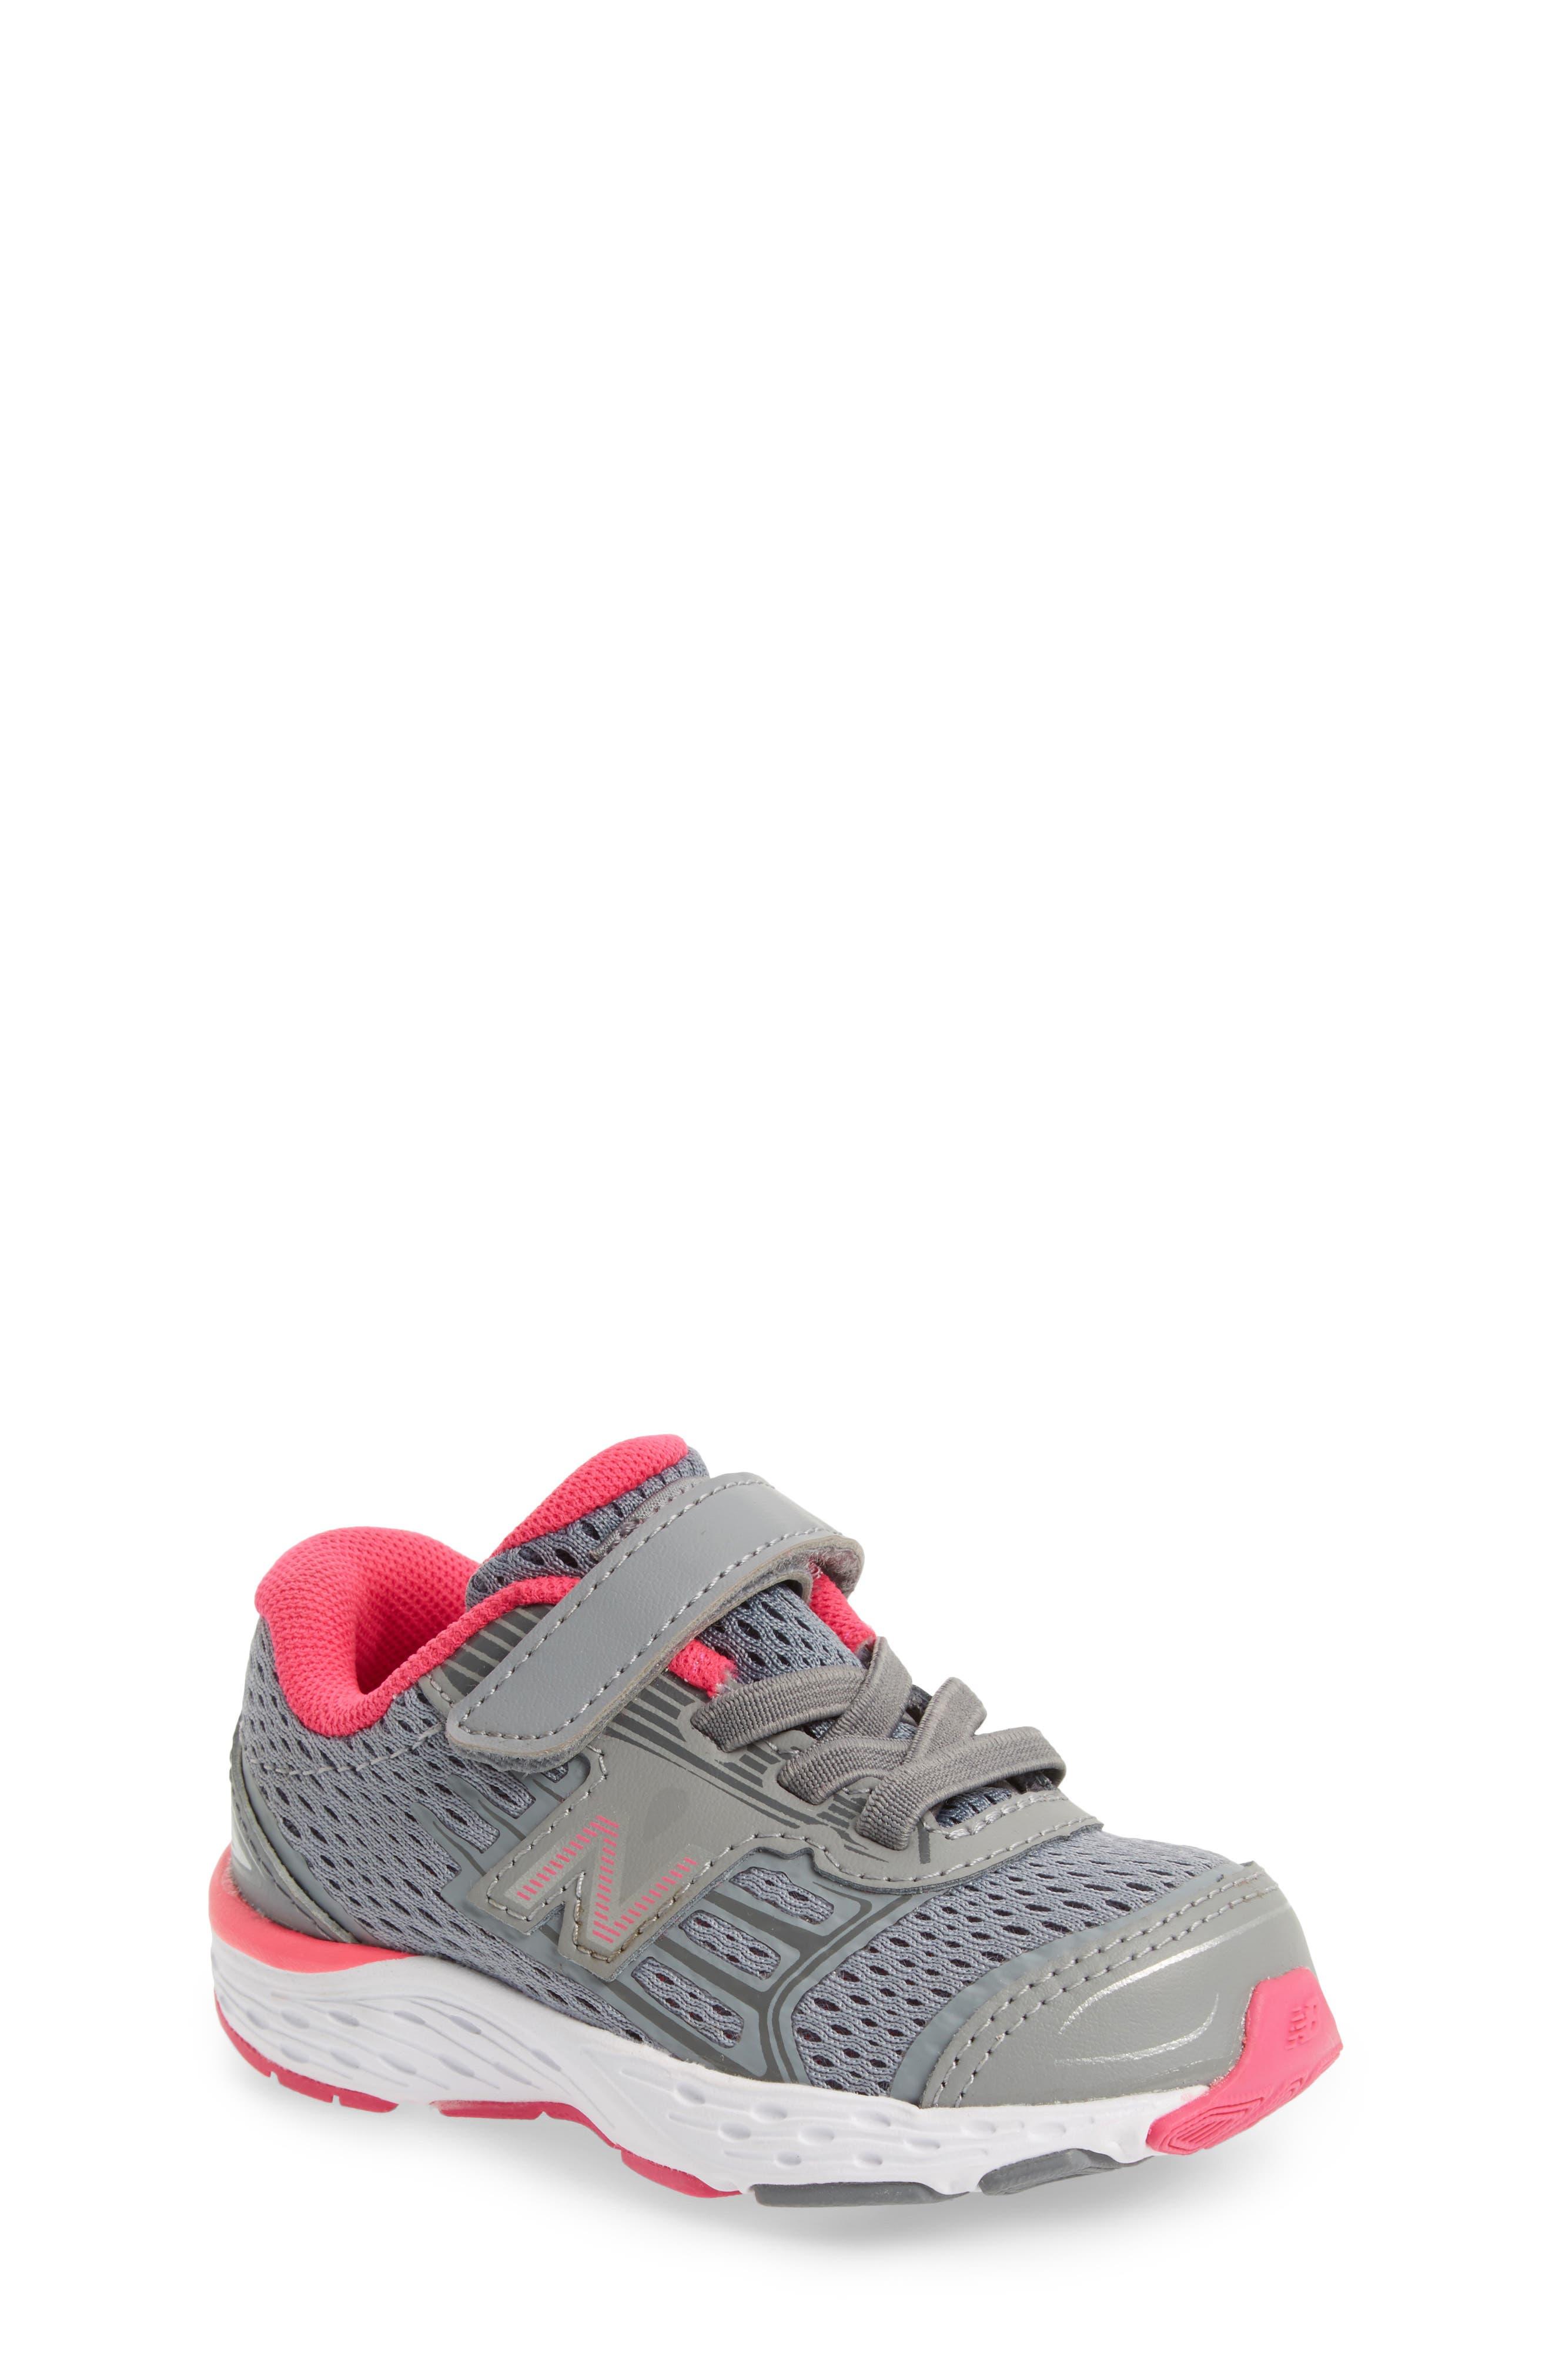 New Balance 680v5 Sneaker (Baby, Walker, Toddler, Little Kid & Big Kid)